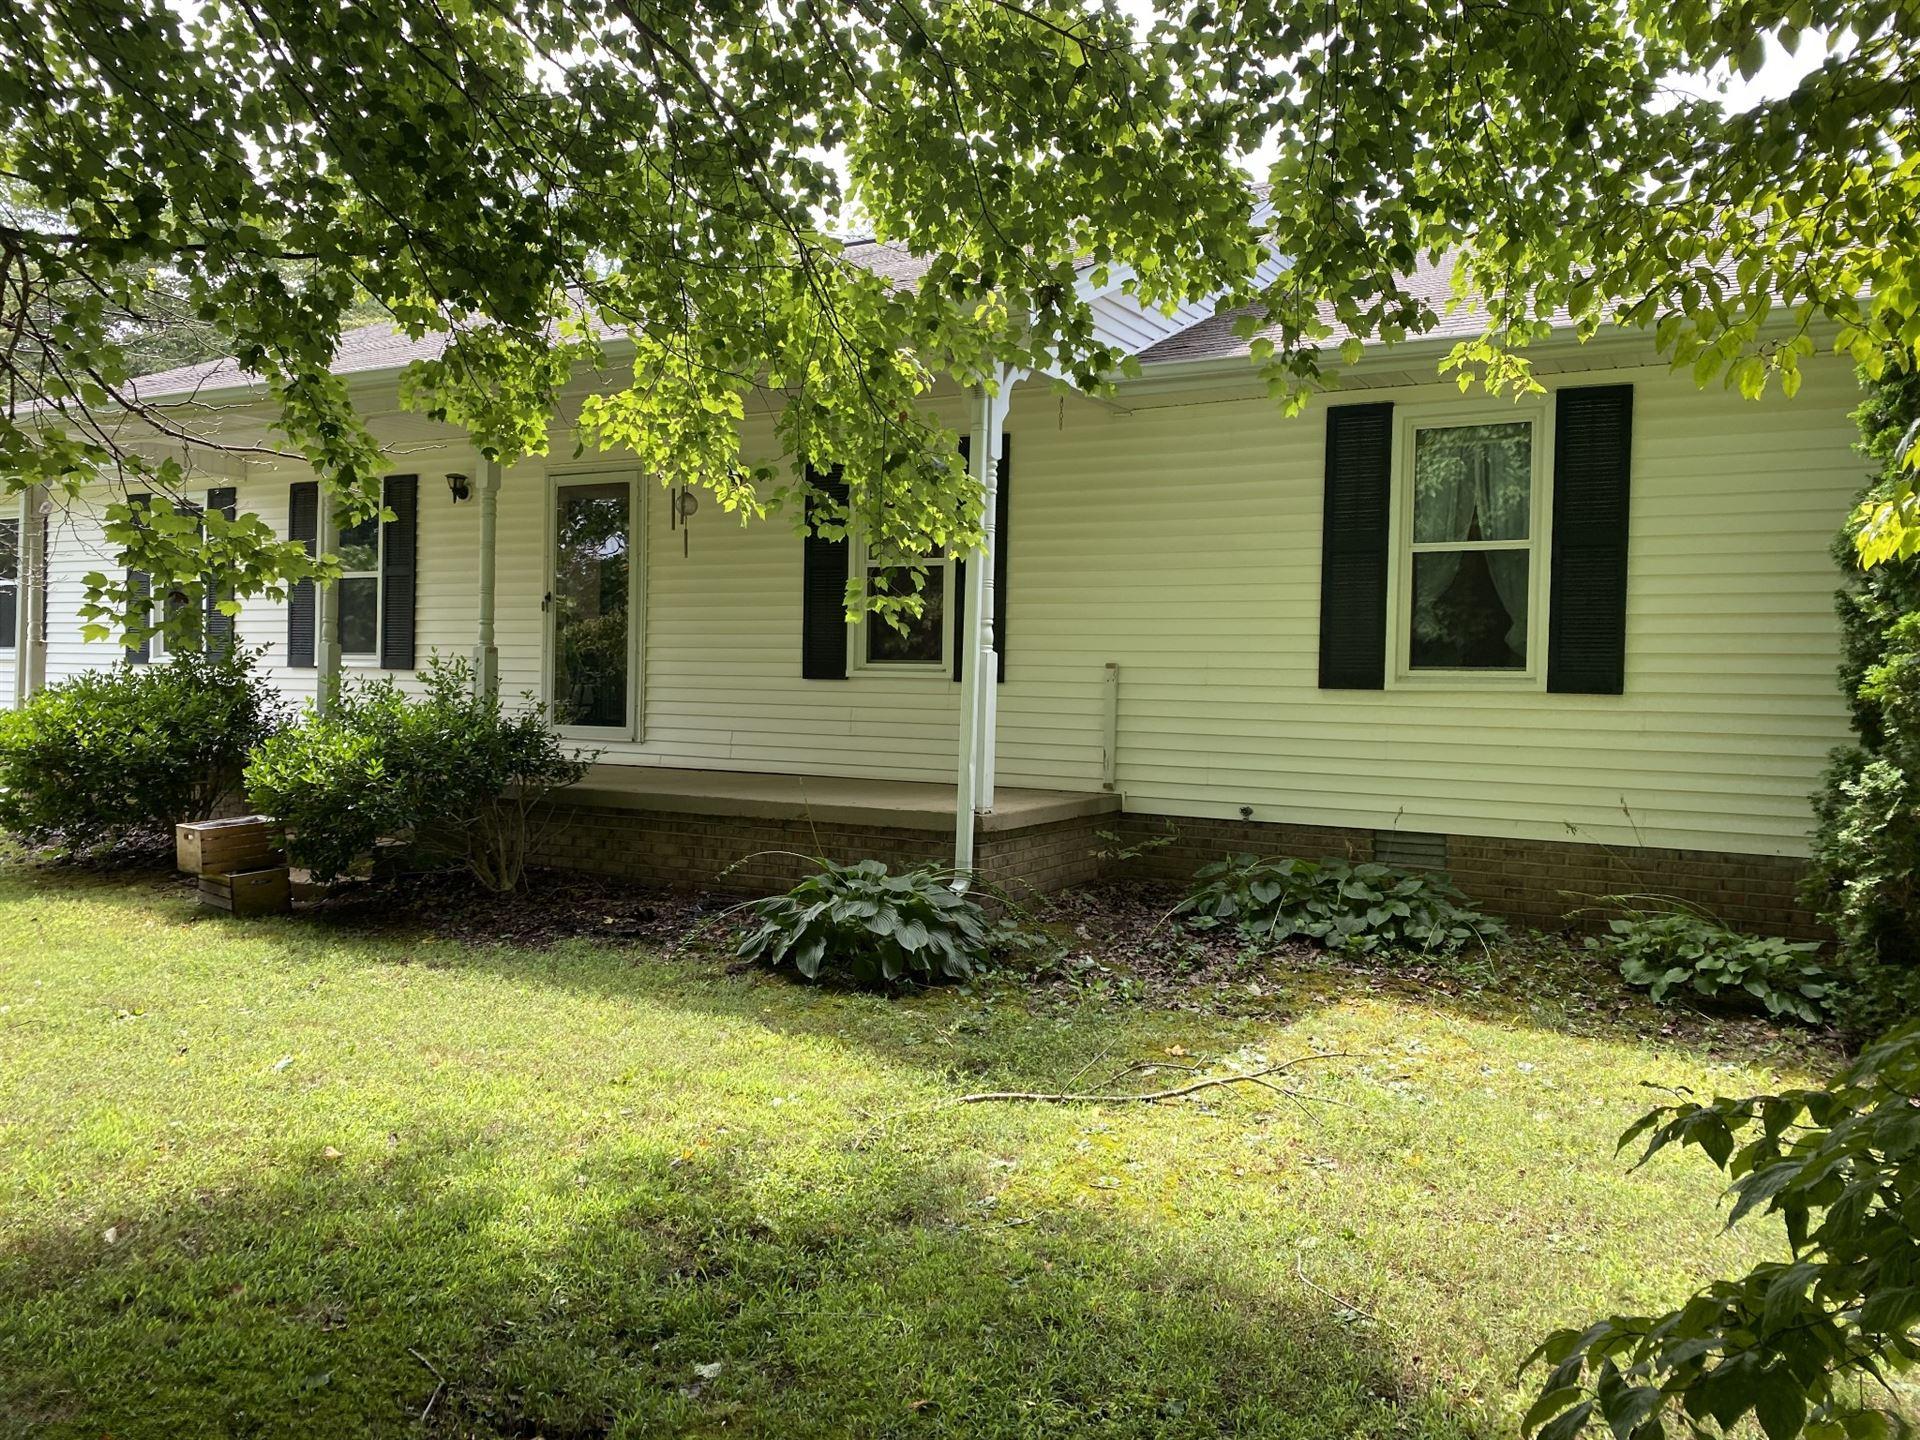 Photo of 224 Old Columbia Rd, Dickson, TN 37055 (MLS # 2277871)